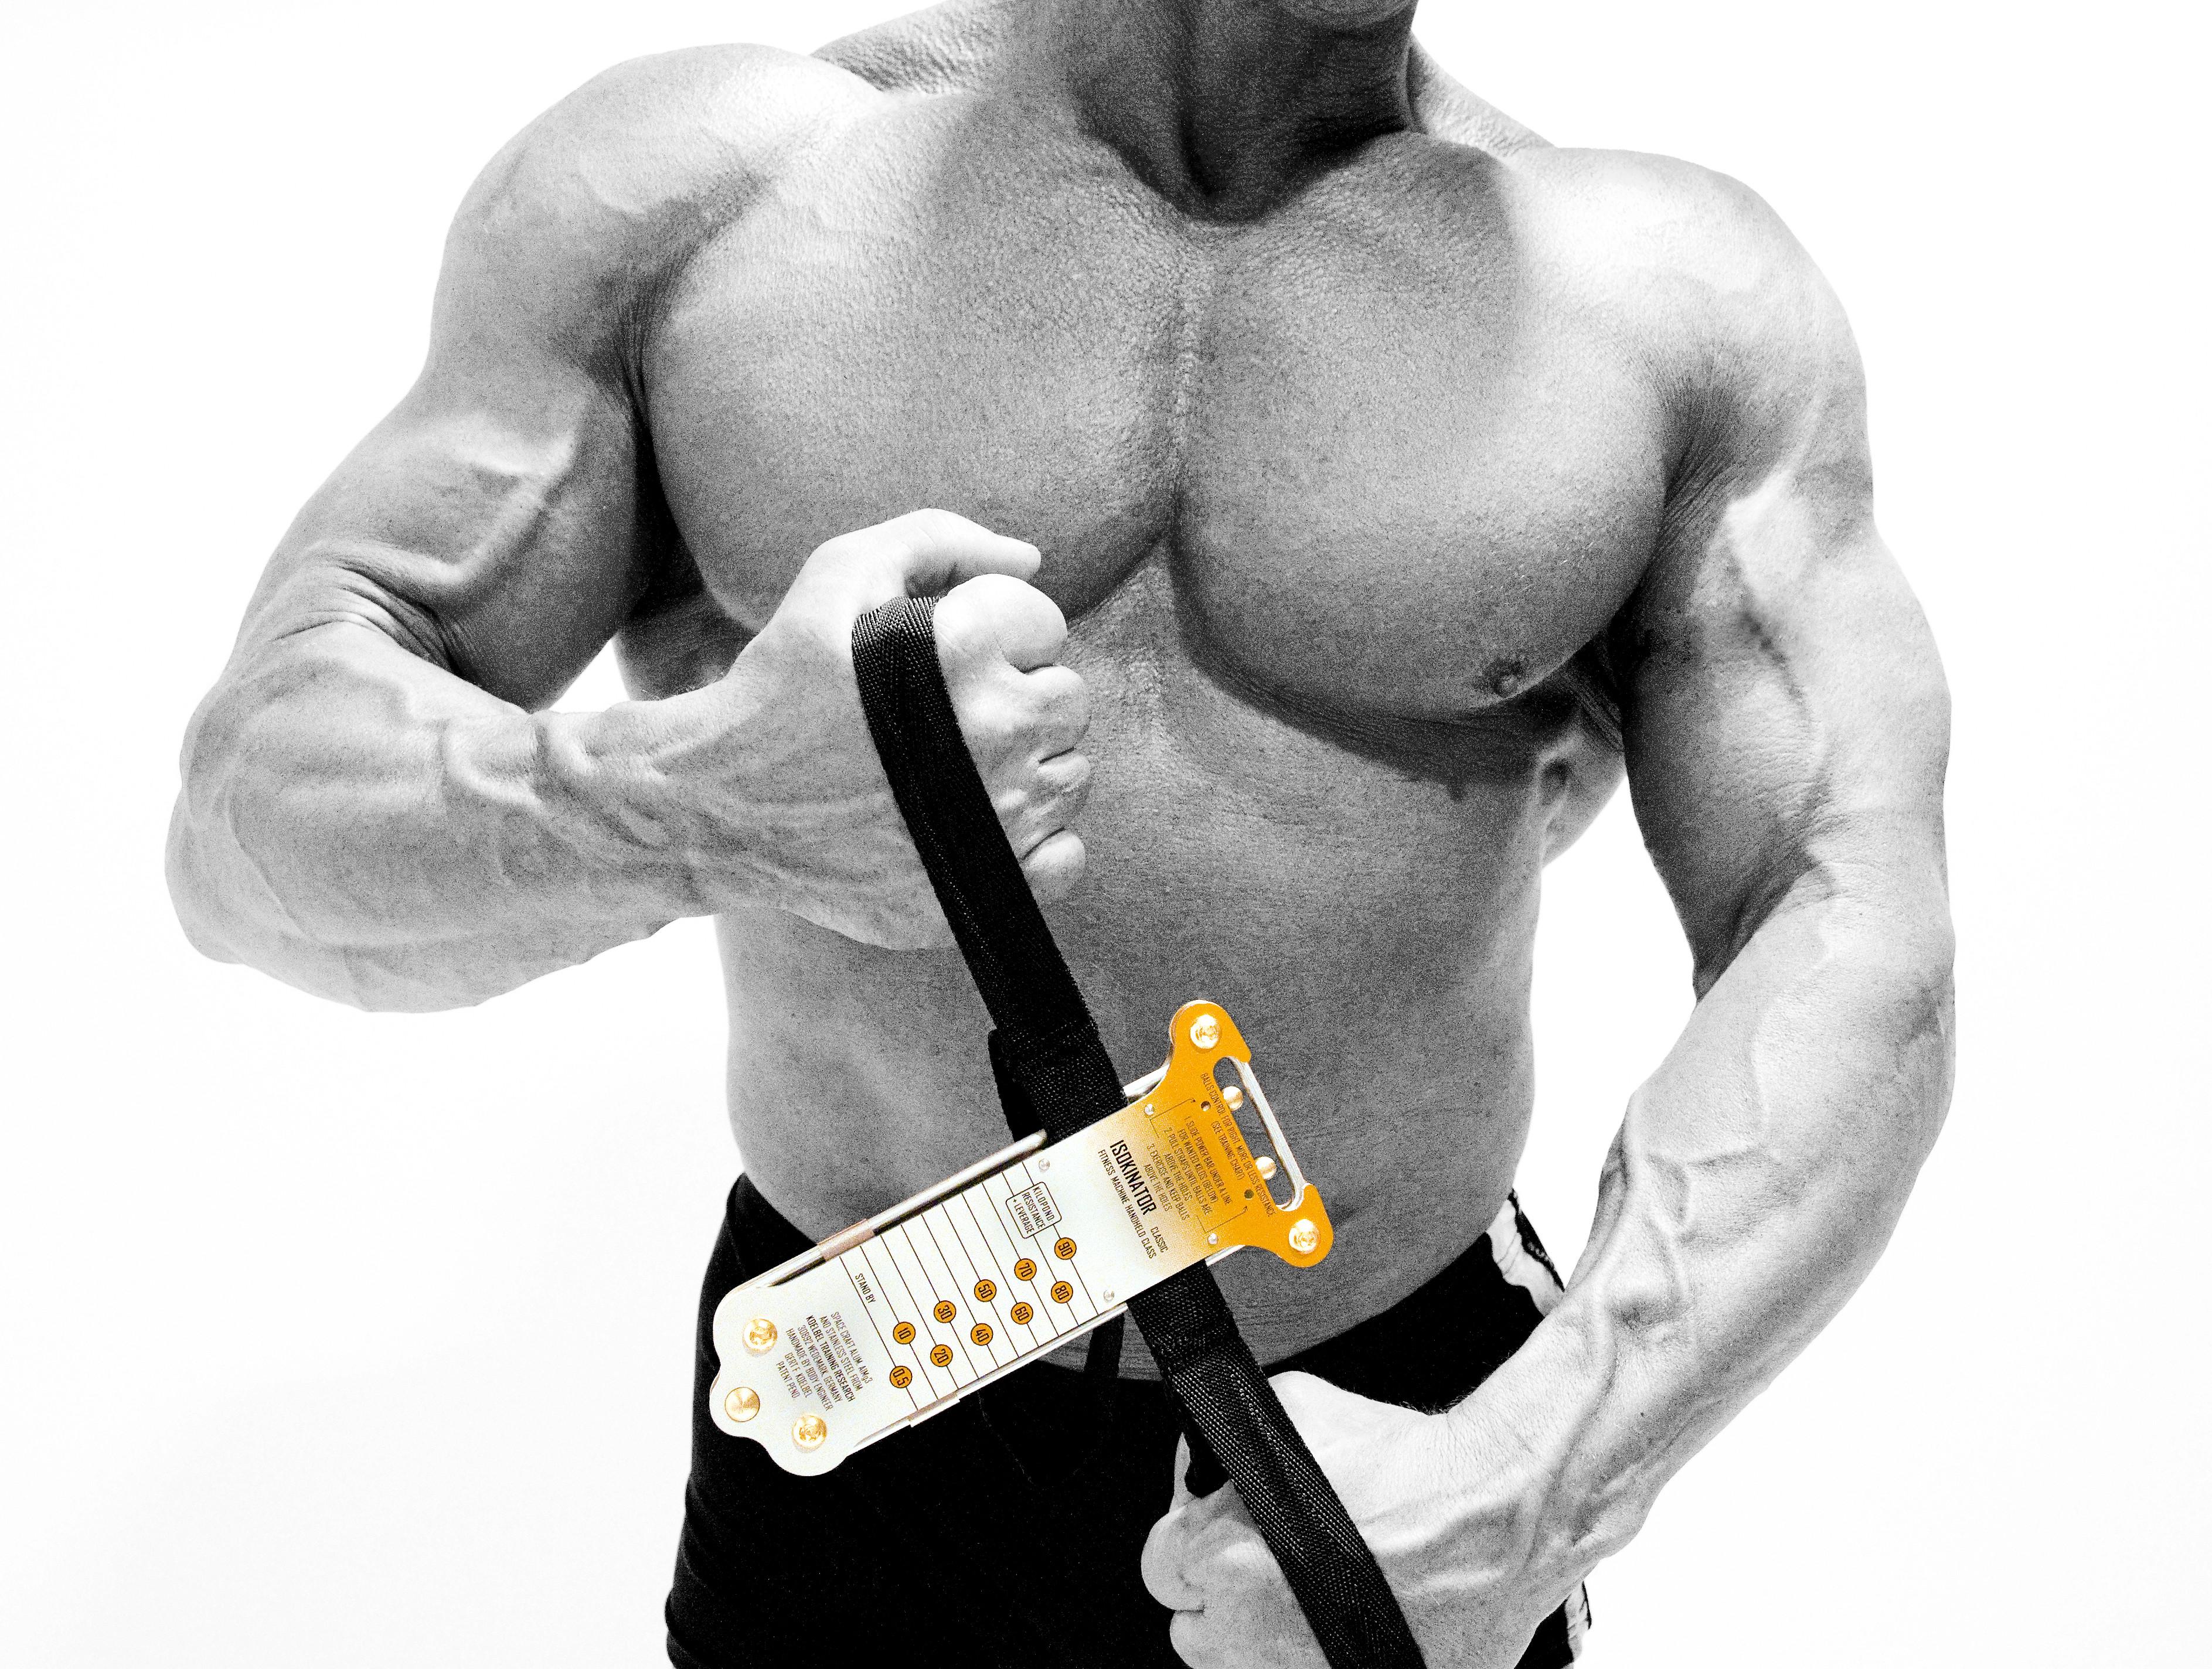 Muskelaufbau Zu Hause  Muskelaufbau Zu Hause Geräte